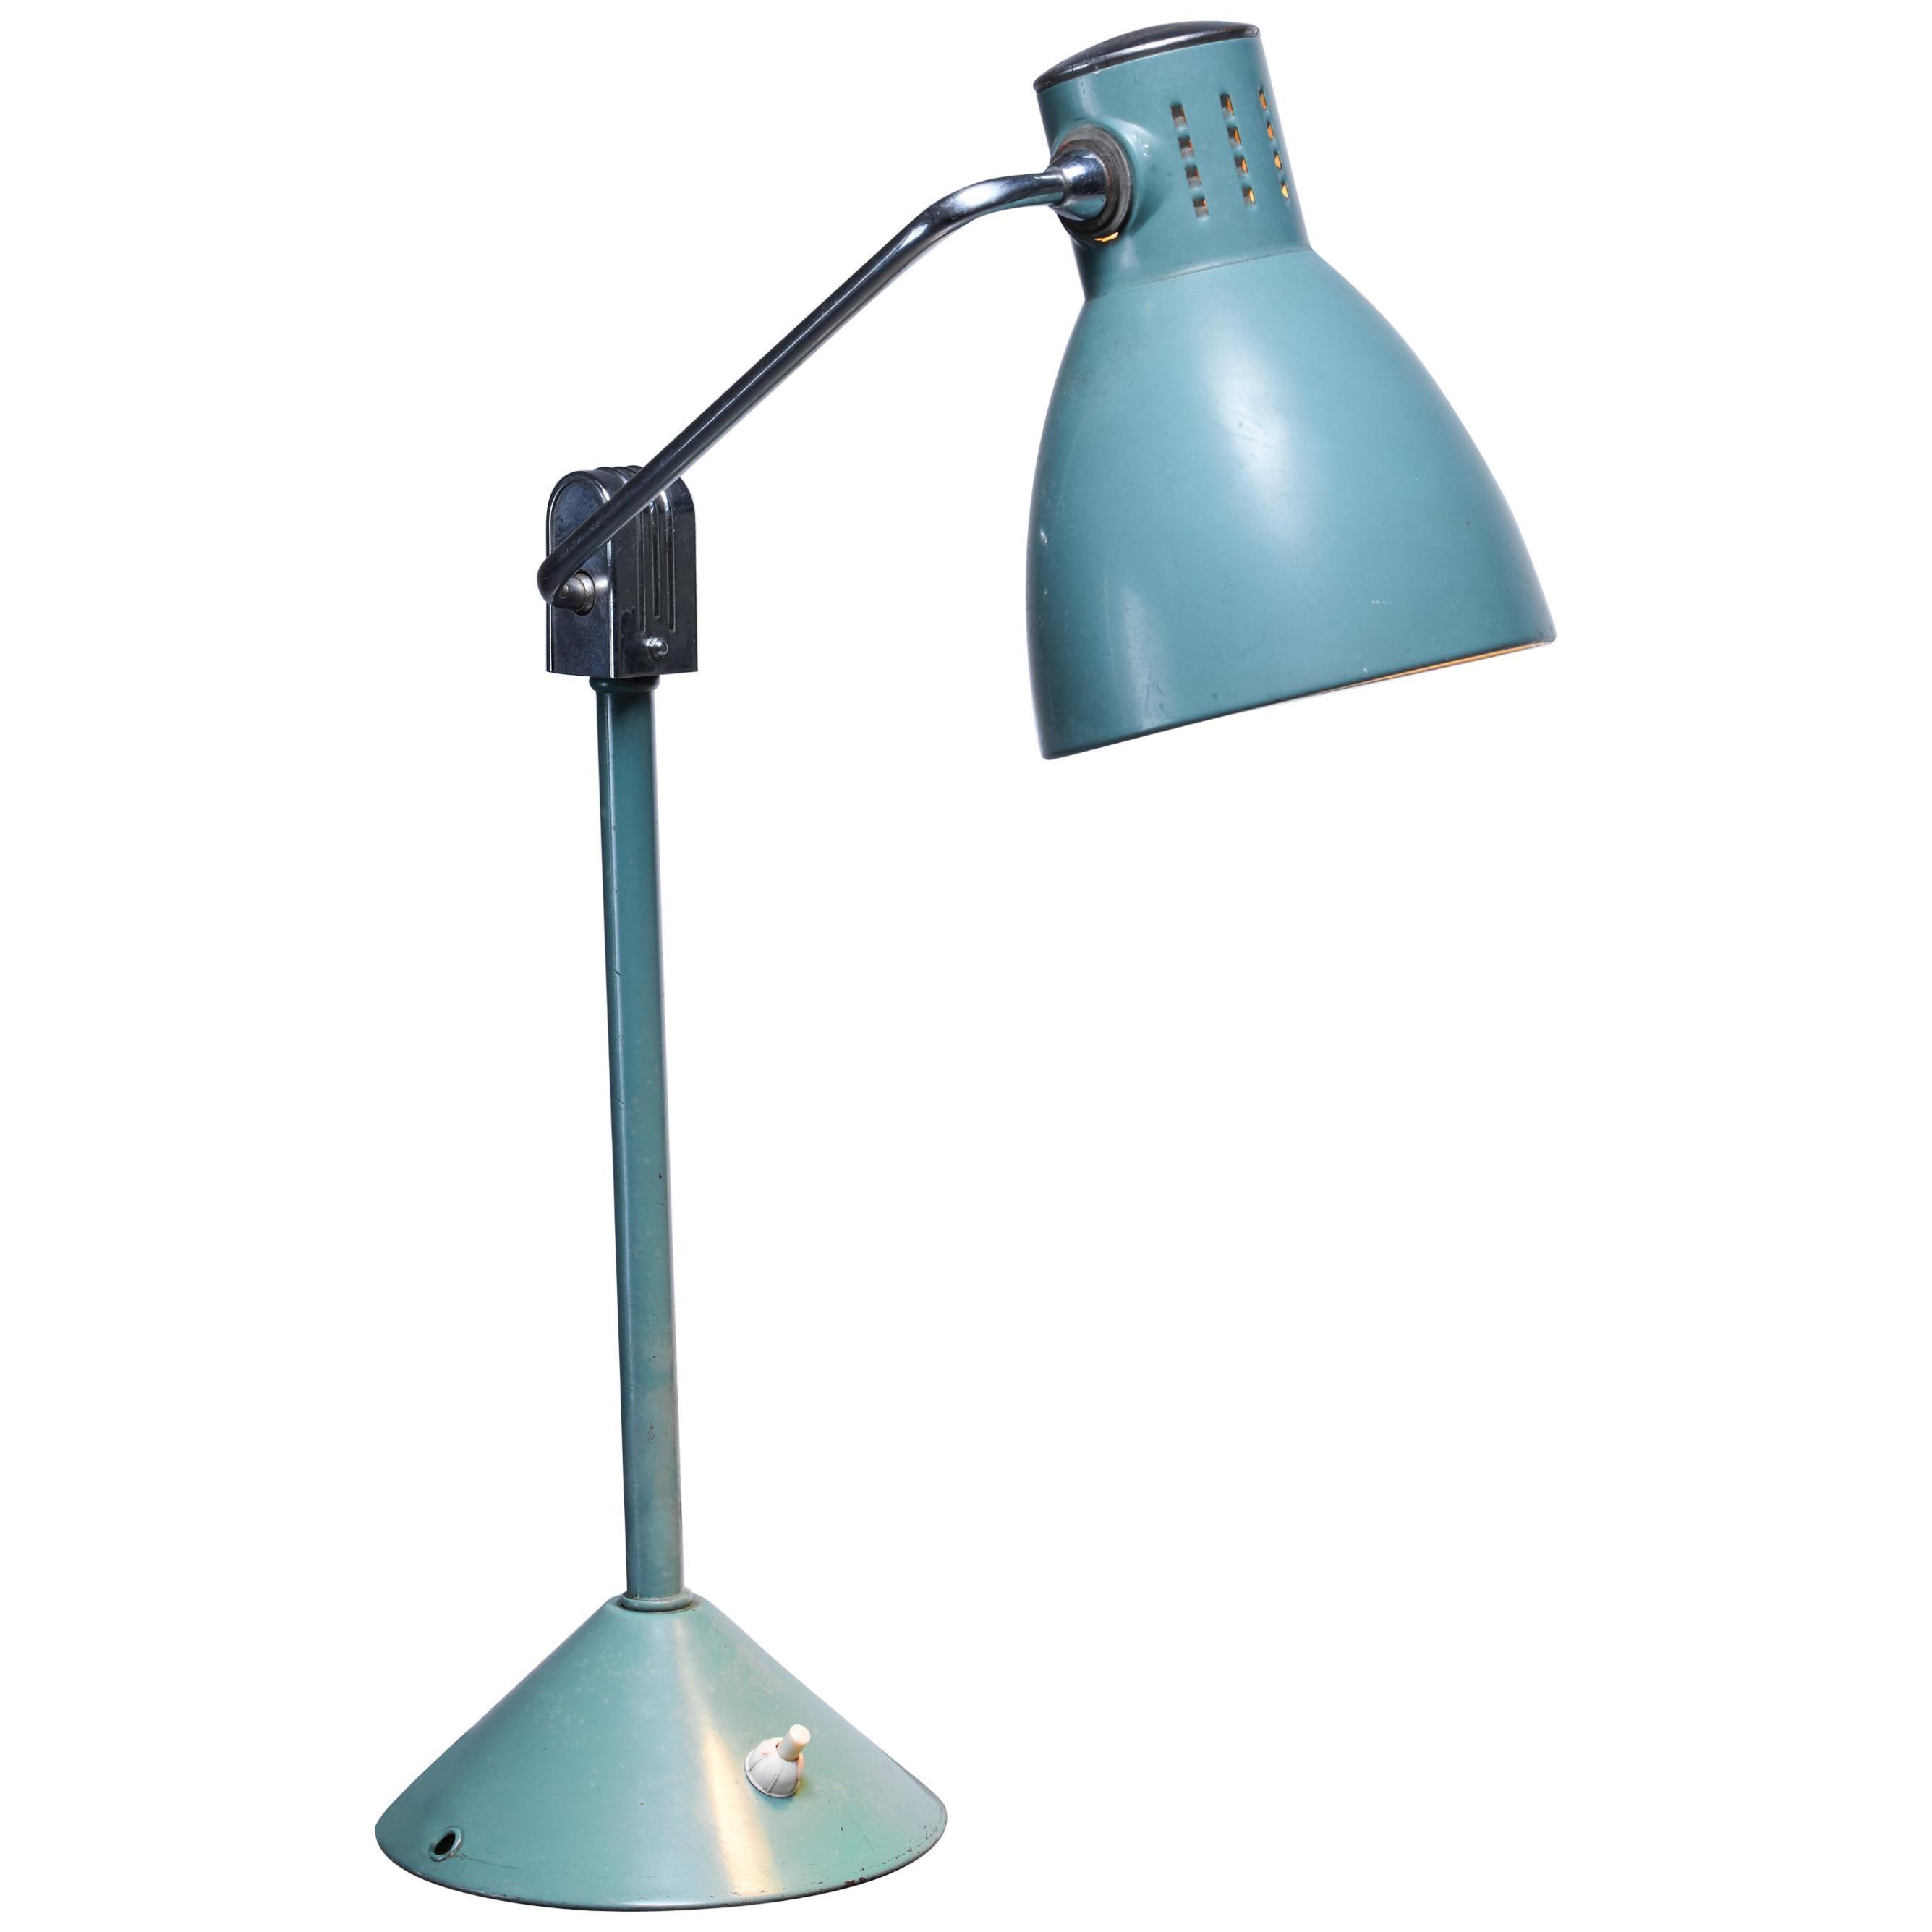 Green Jumo Table Lamp, France, 1940s